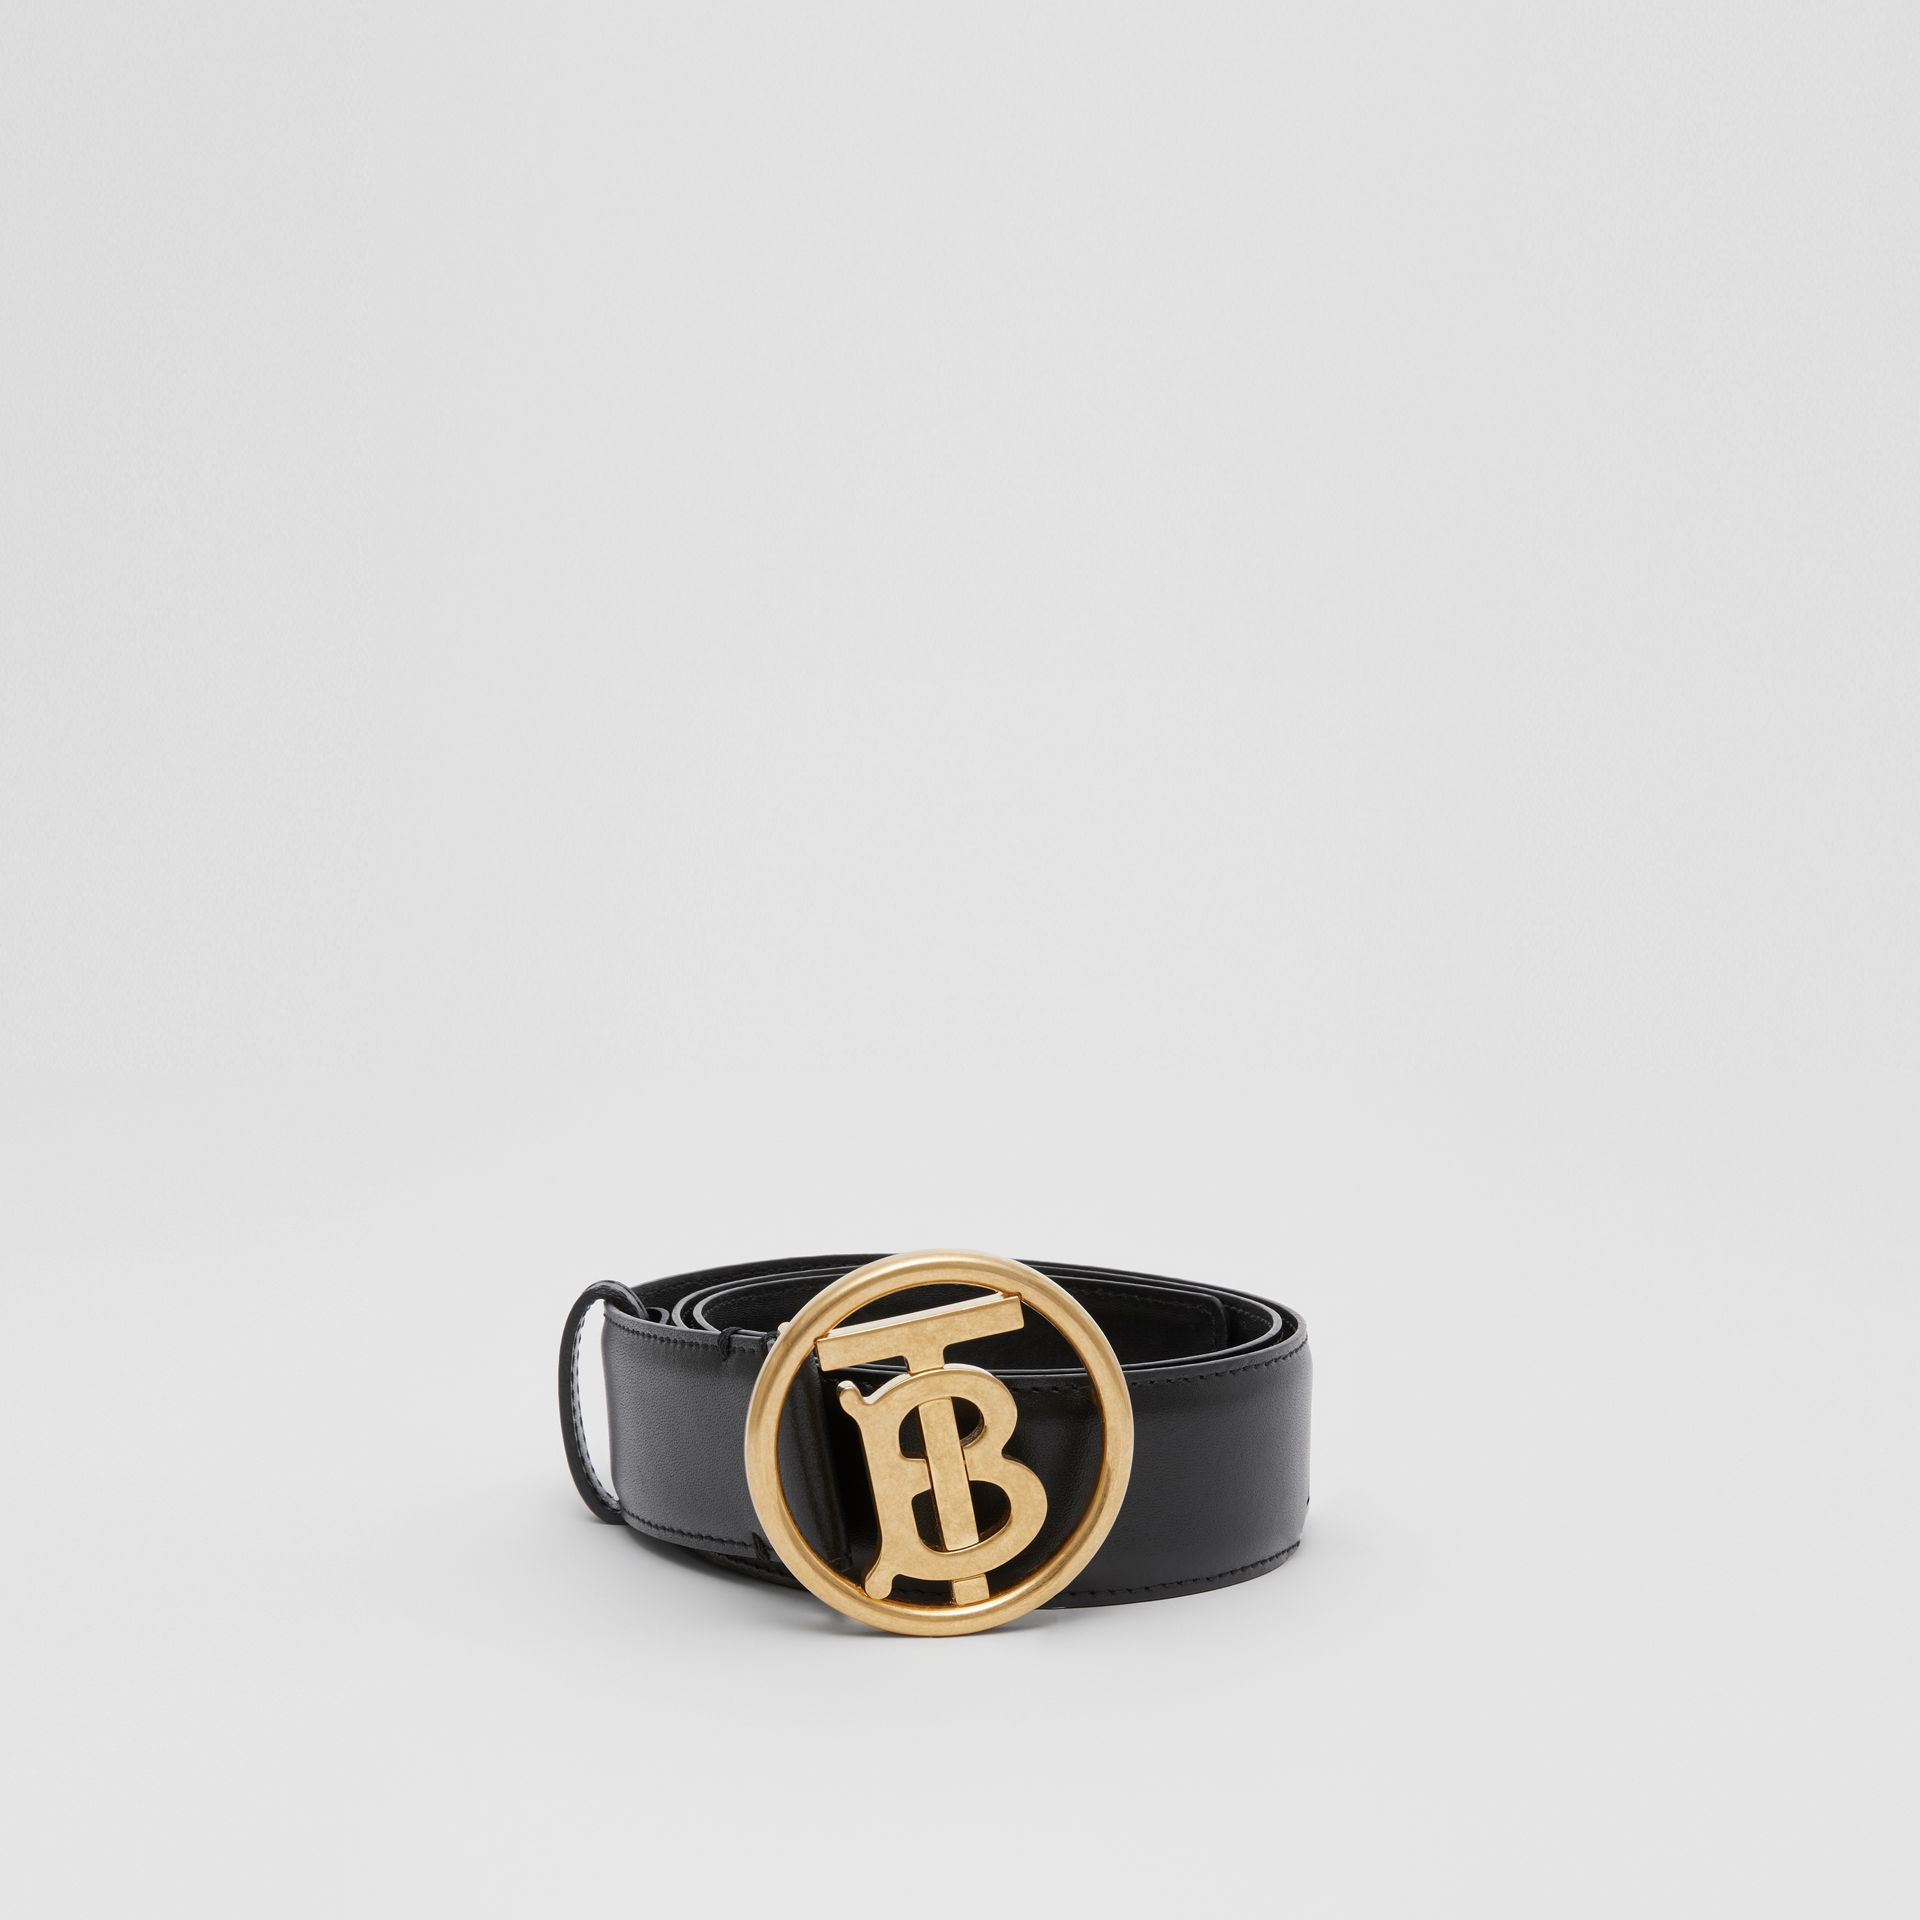 Monogram Motif Leather Belt in Black - Women | Burberry - gallery image 3